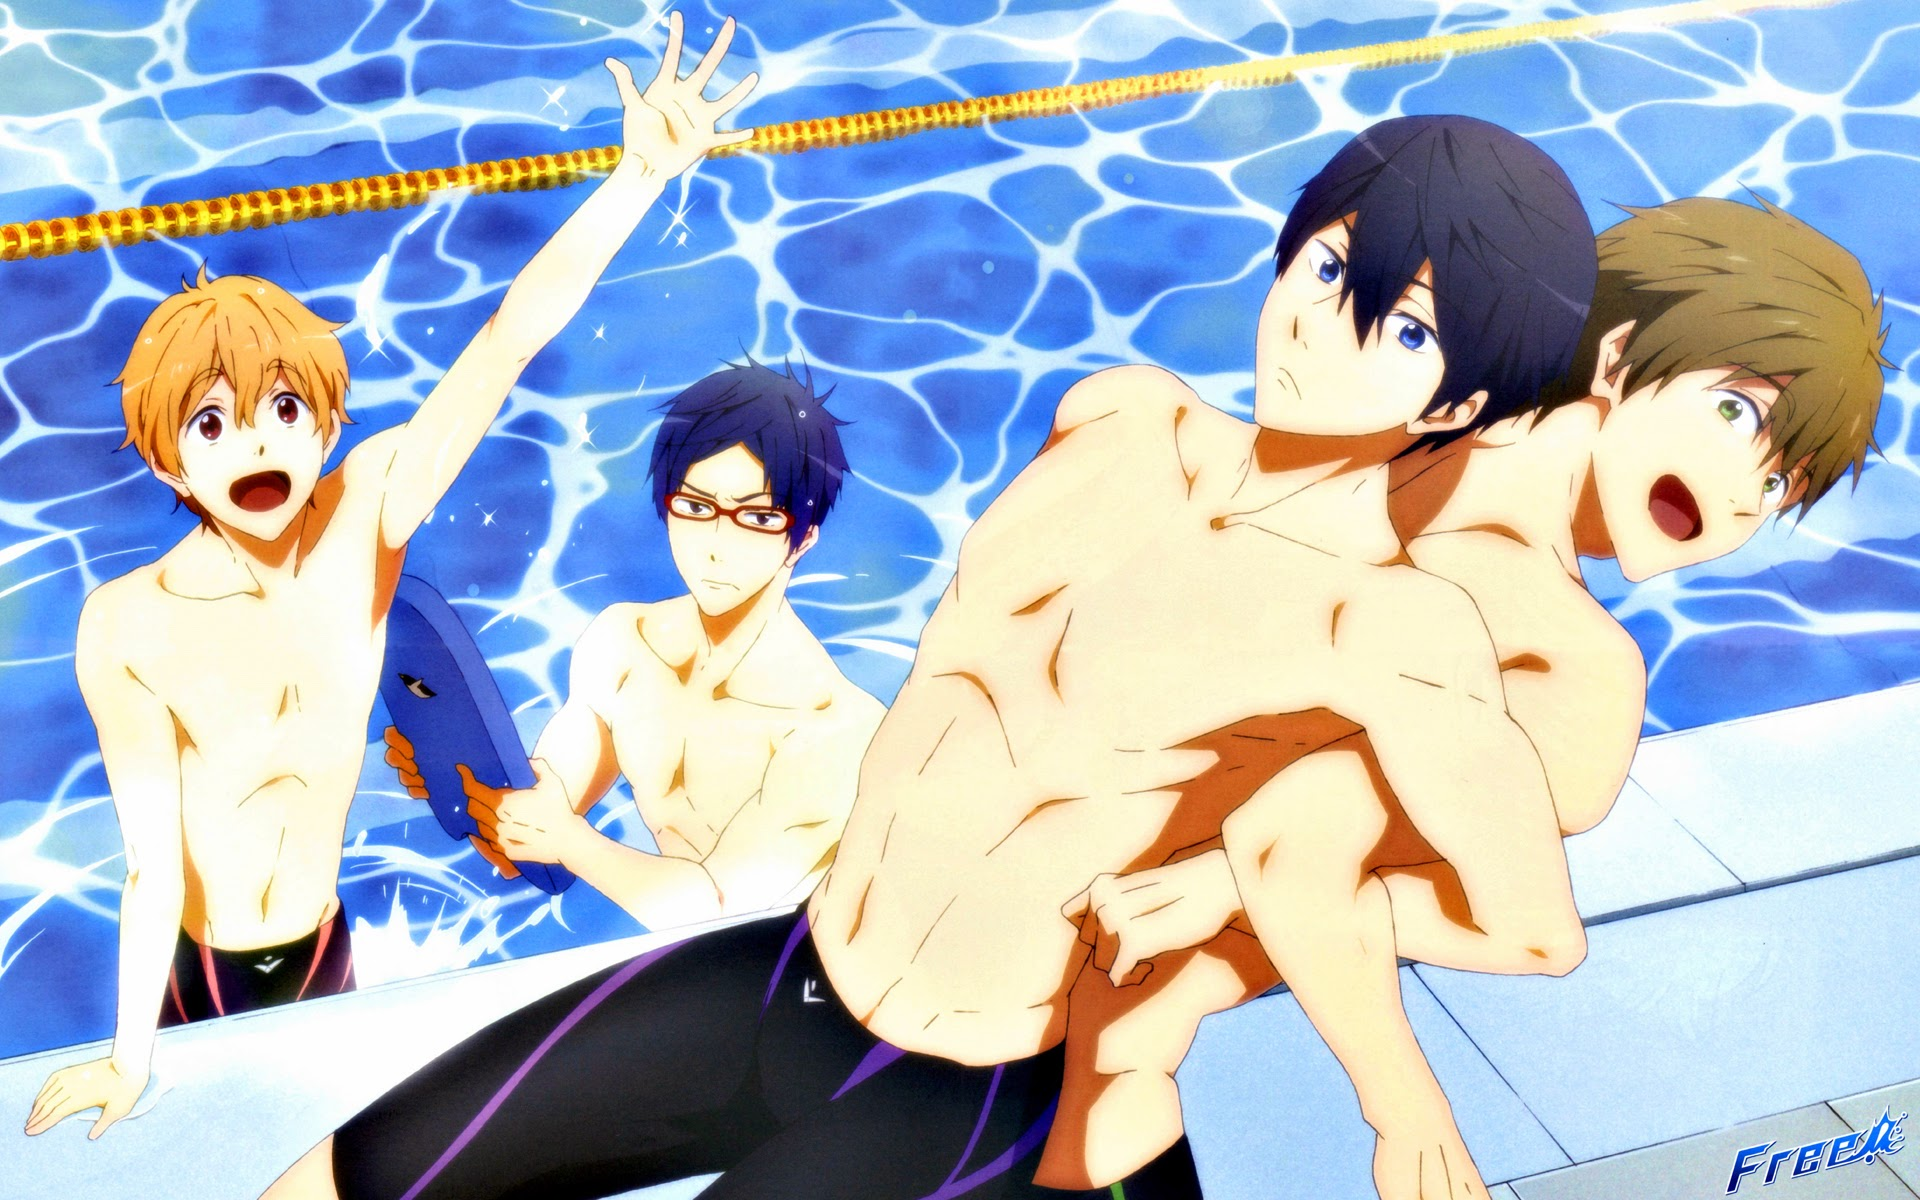 Free Download Anime Iwatobi Swim Club 01b Hd Wallpaper